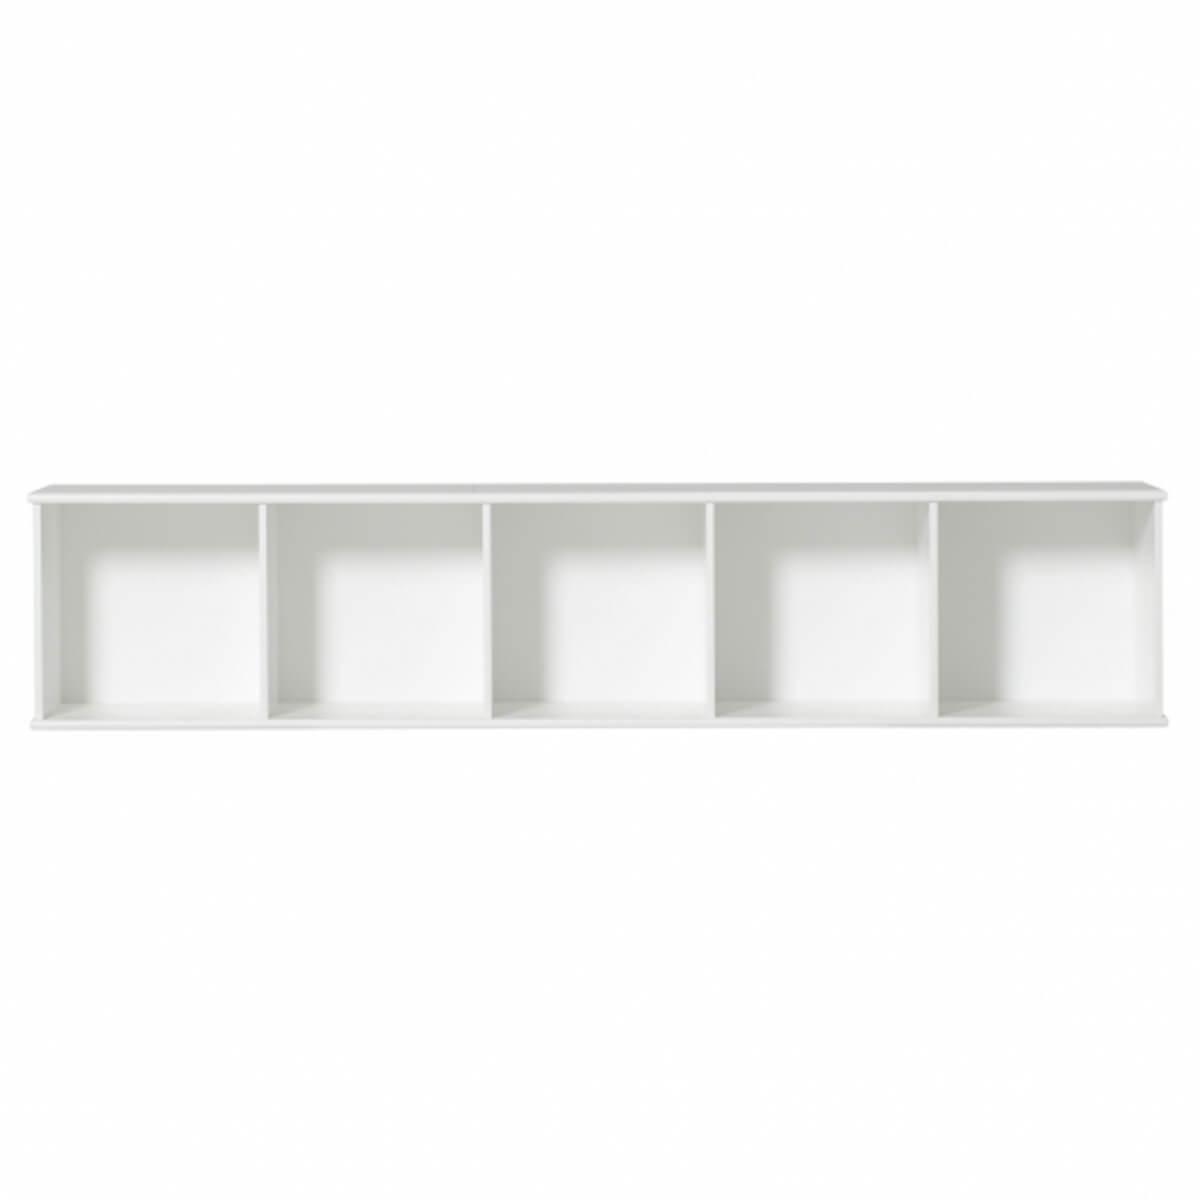 Meuble-banquette 174x43cm WOOD Oliver Furniture blanc